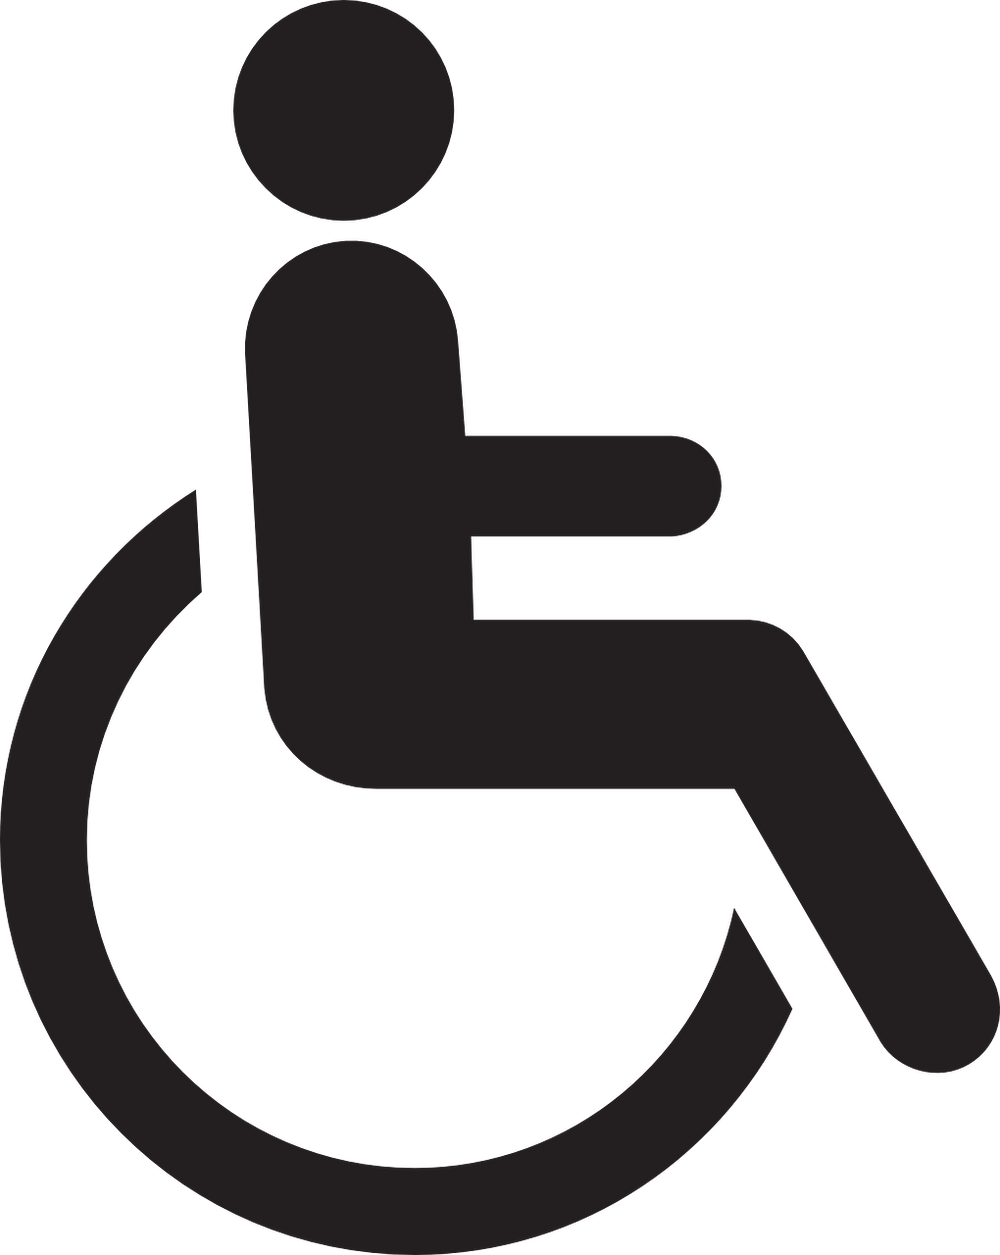 Black wheelchair symbol